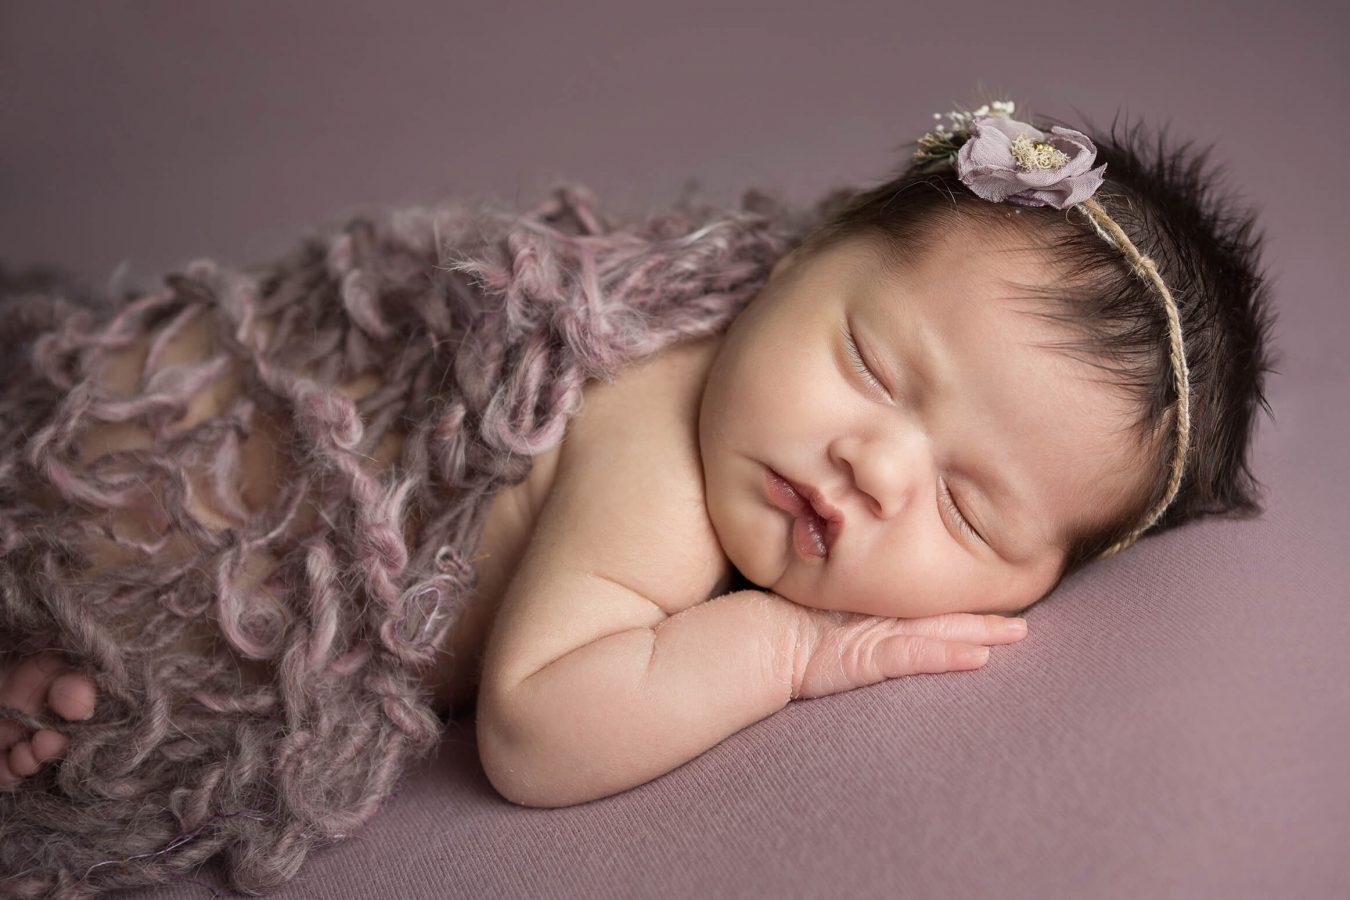 newborn girl in purple with handmade blanket and flower crown